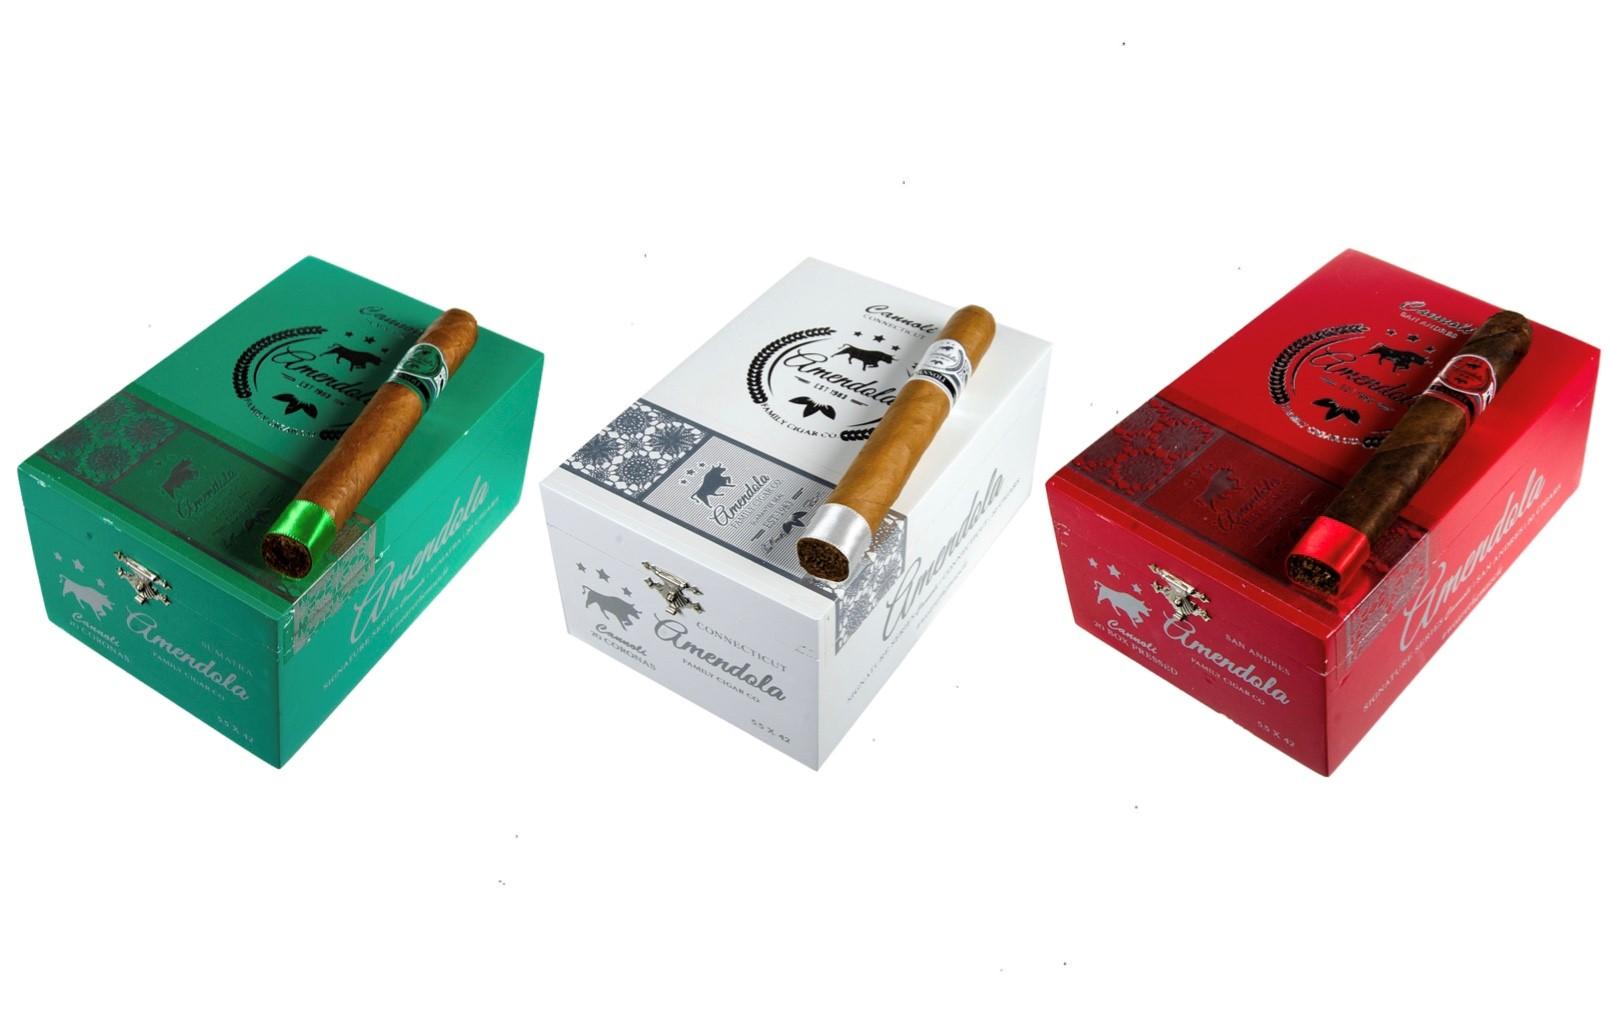 Amendola Family Cigar Co. Cannoli Series cigar boxes